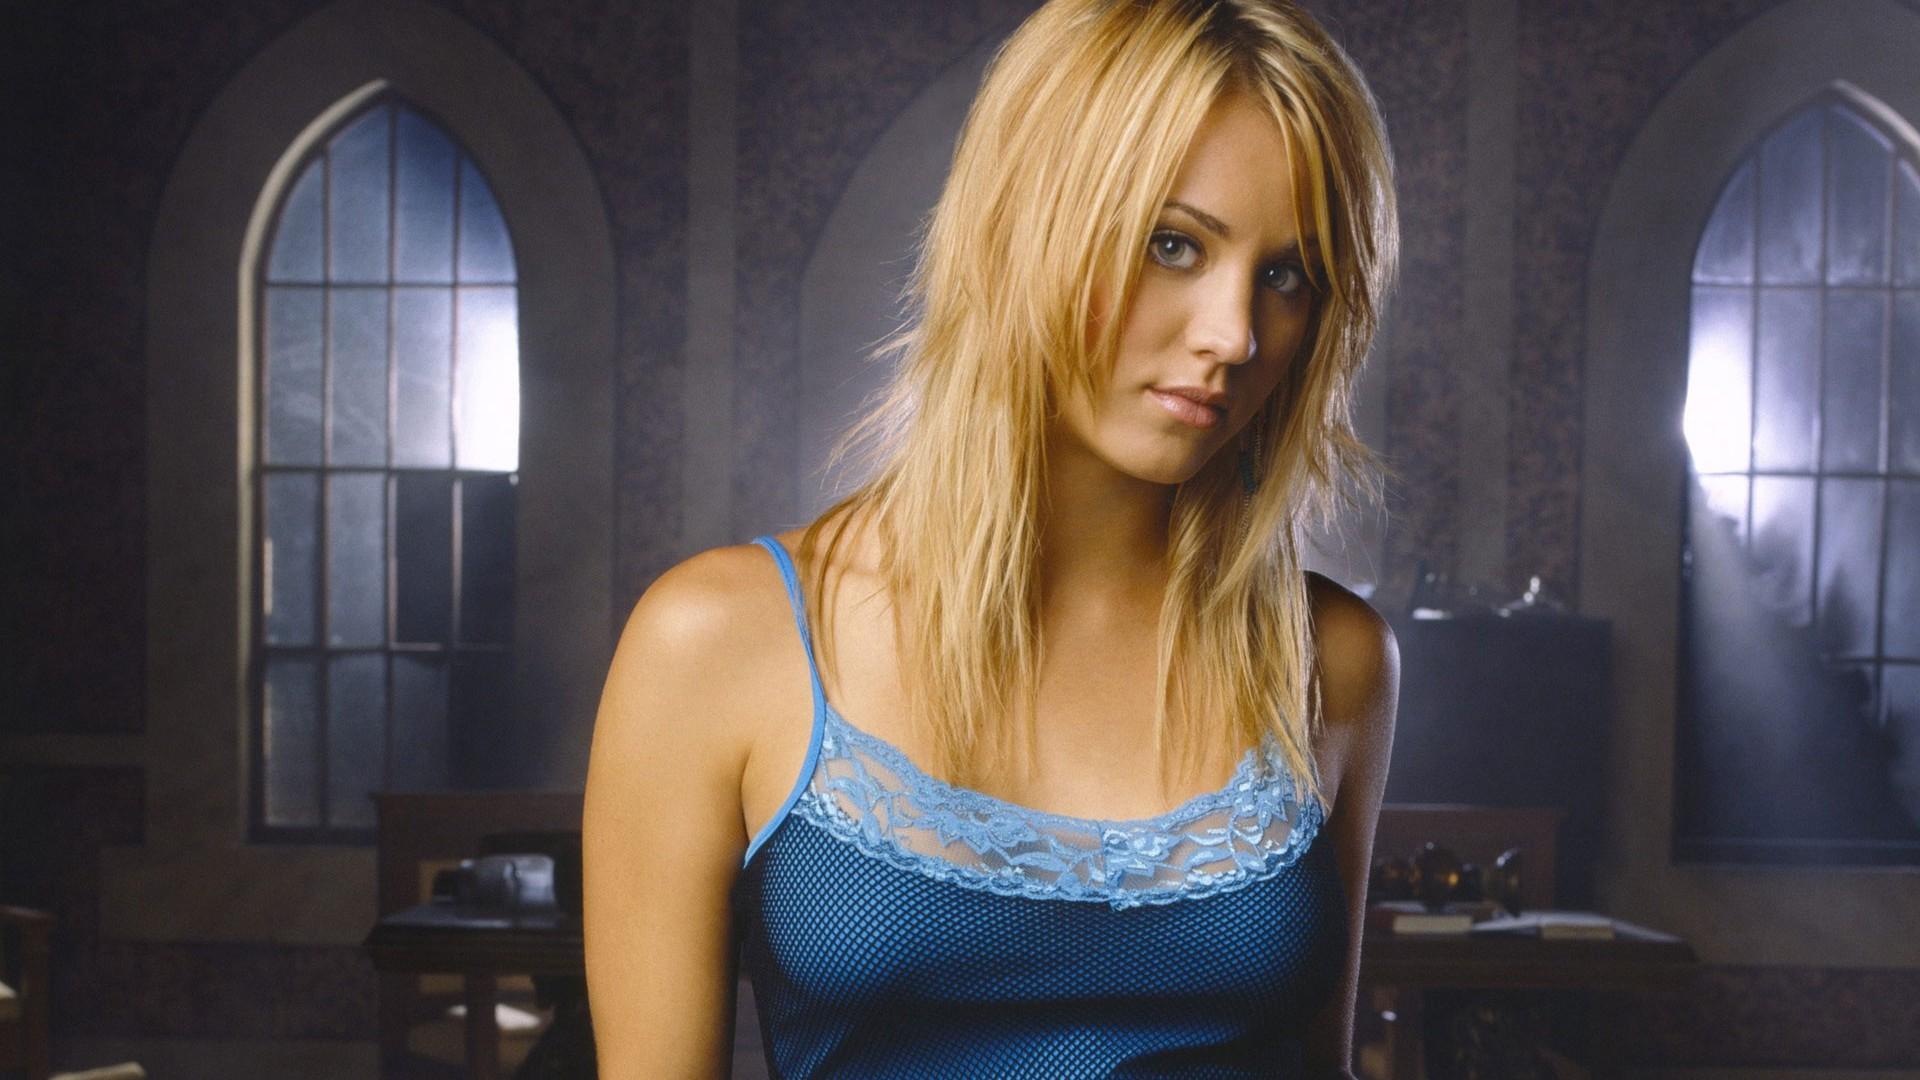 Celebrity – Kaley Cuoco Beautiful Woman Girl Cute Wallpaper